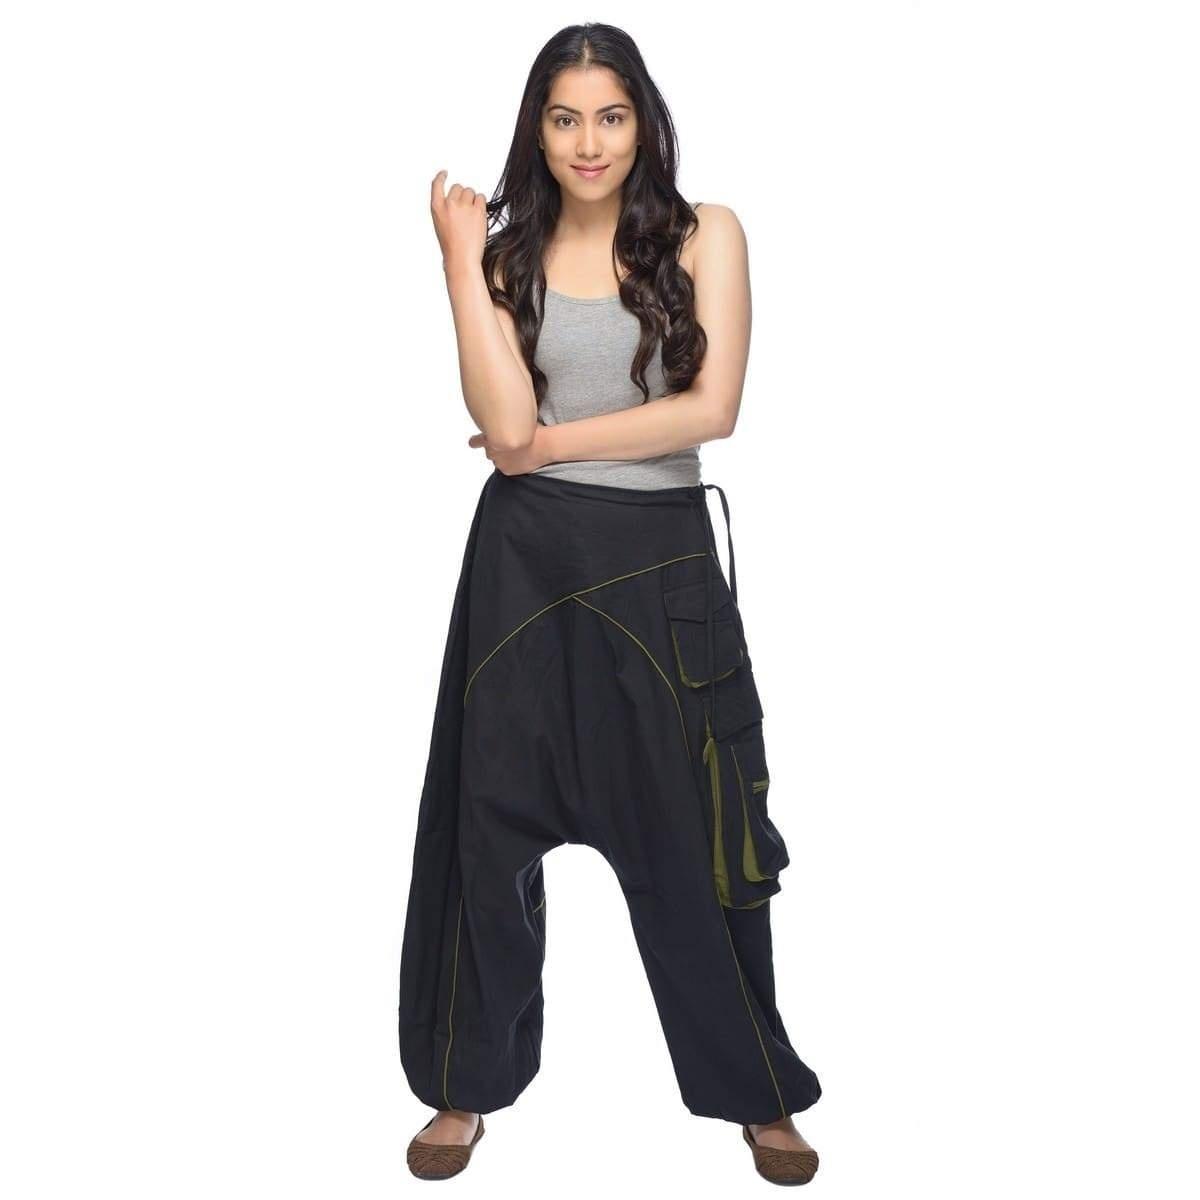 Pump Pantaloni Pocket-Pantaloni Tasche pluderhose Unisex Donna Uomo Yoga Pantaloni palloncino